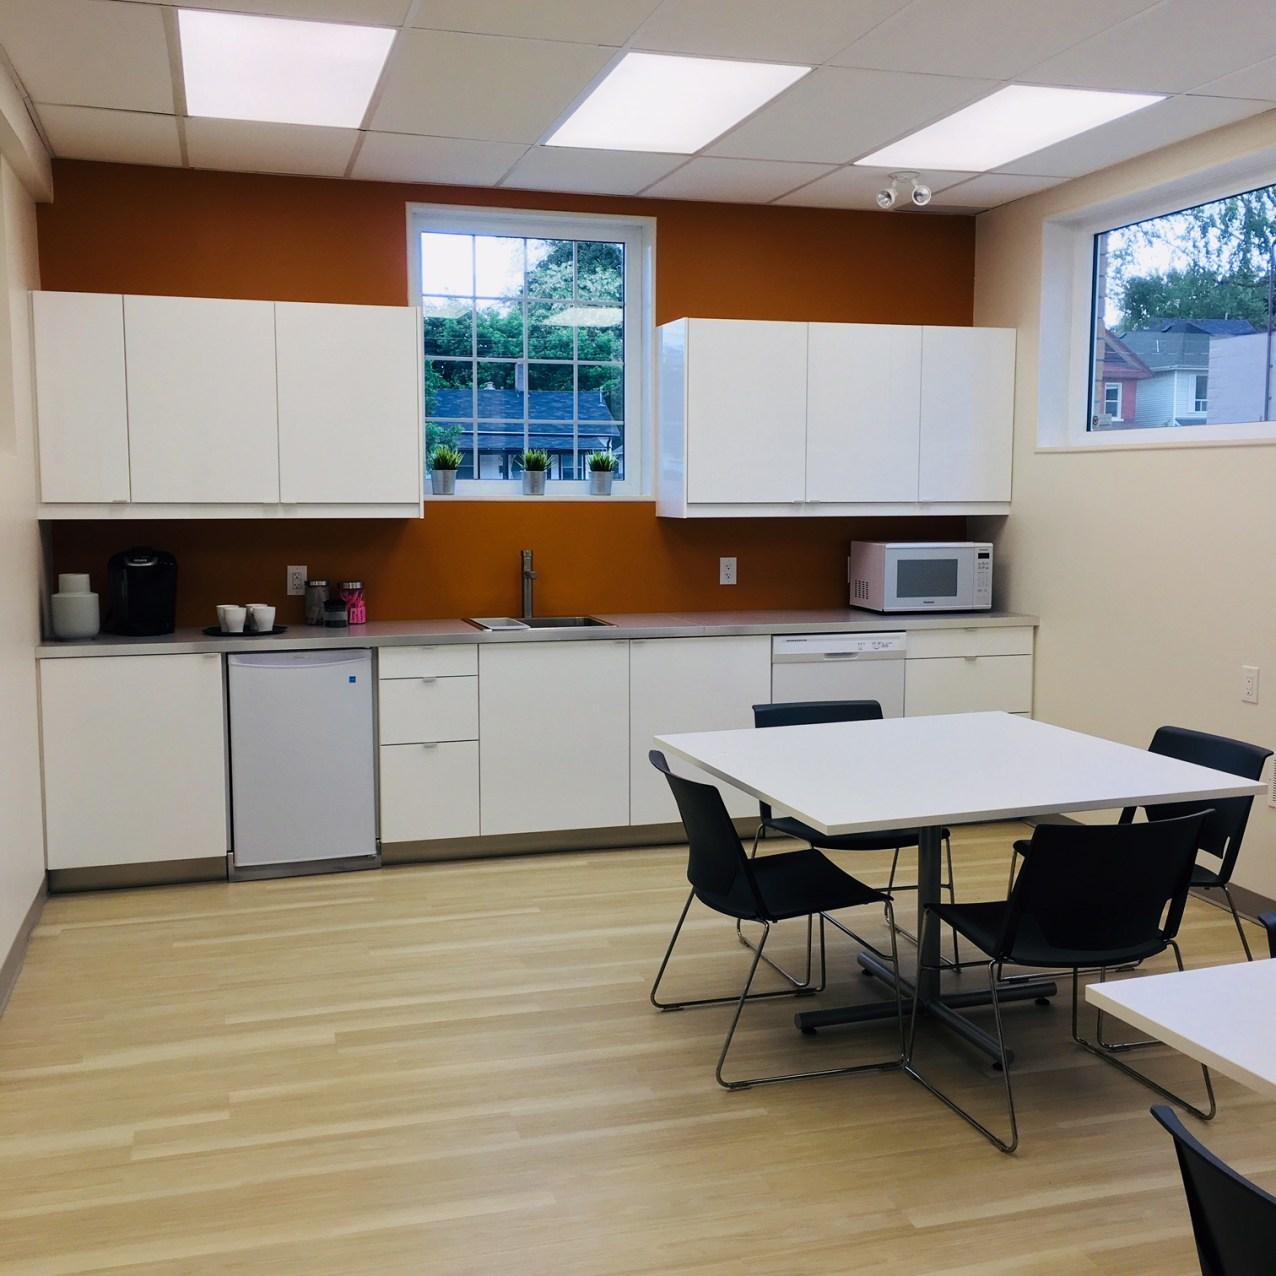 kitchen shared space